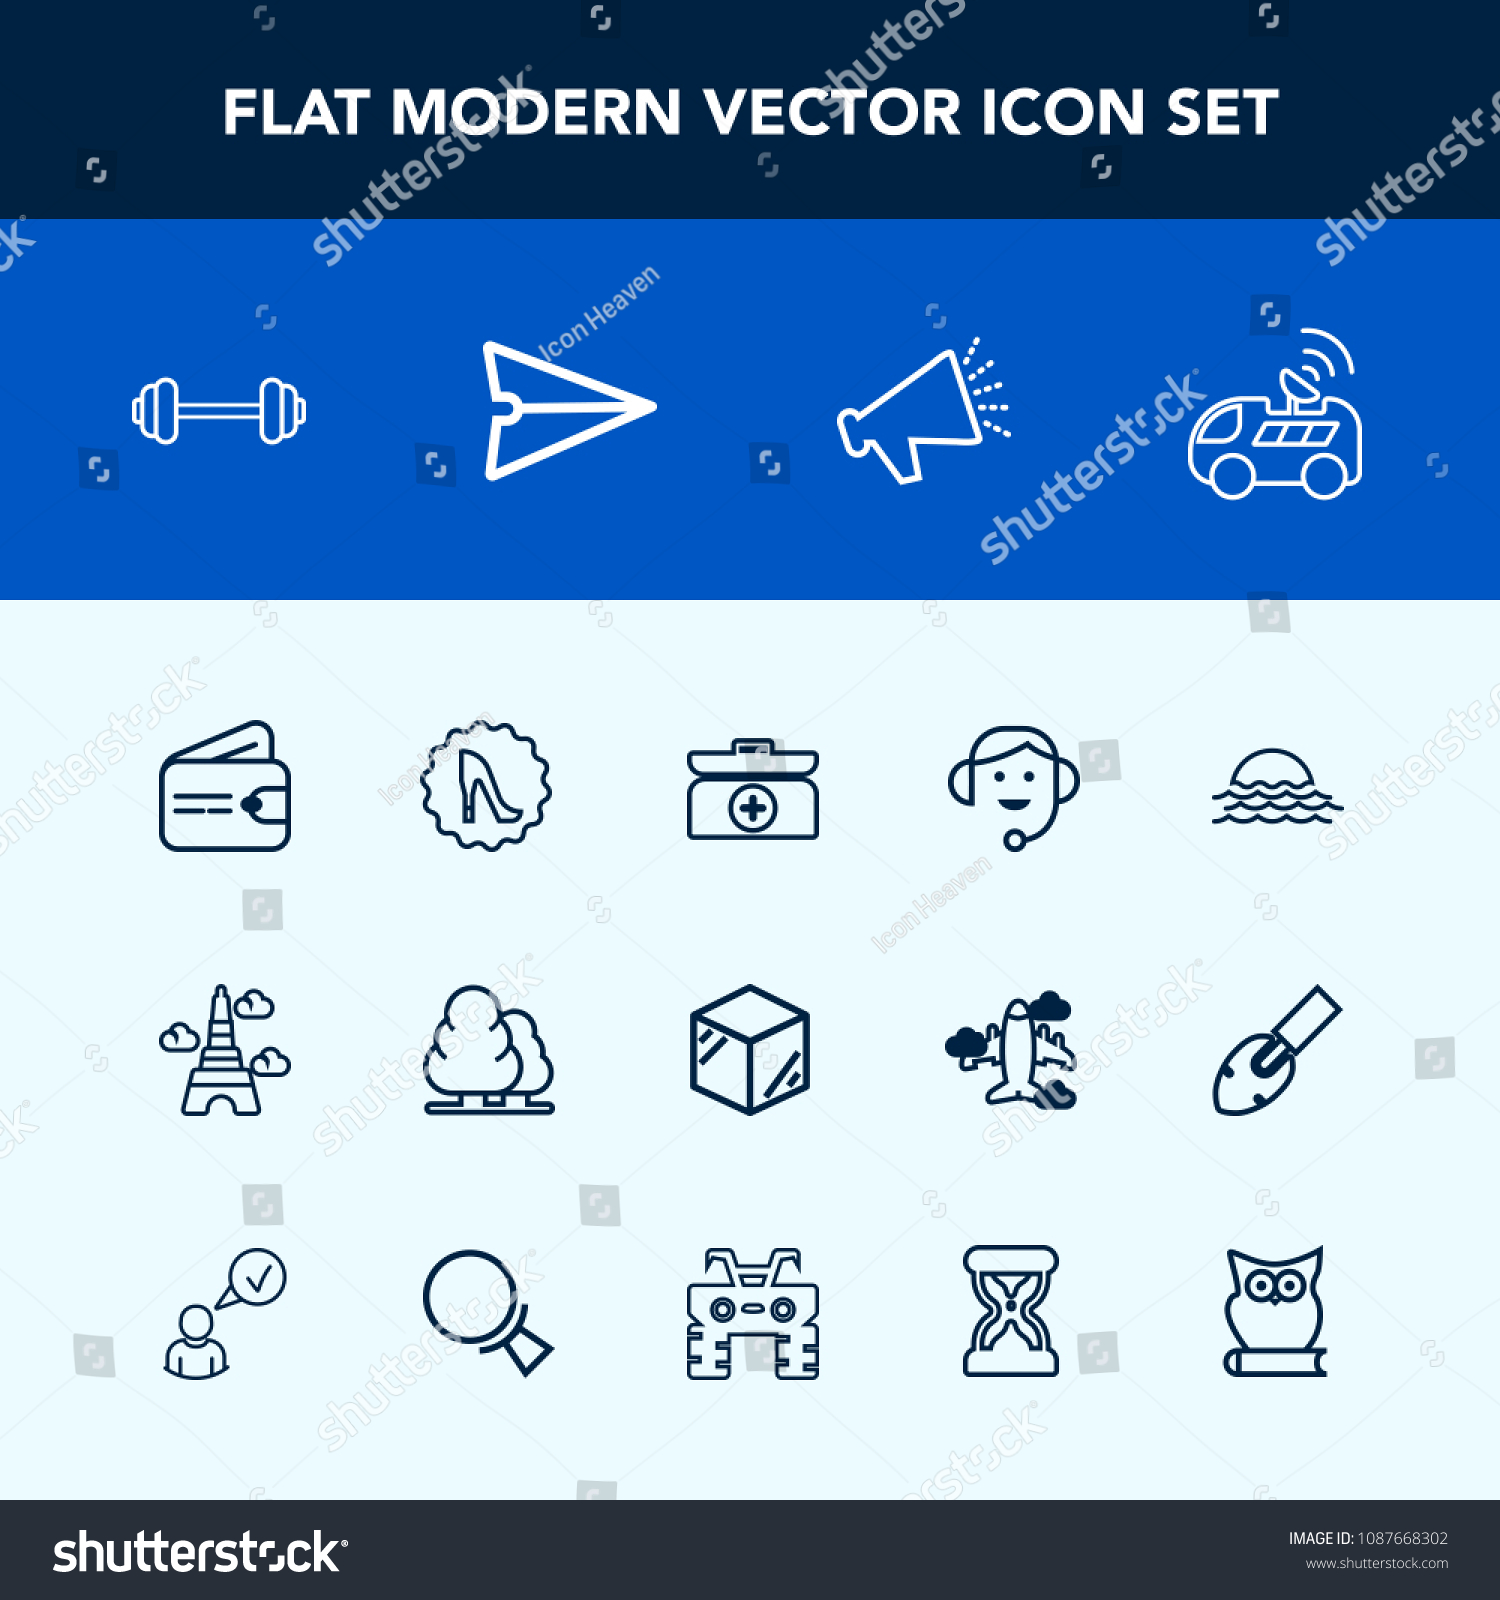 Modern Simple Vector Icon Set Kit Stock Vector 1087668302 - Shutterstock